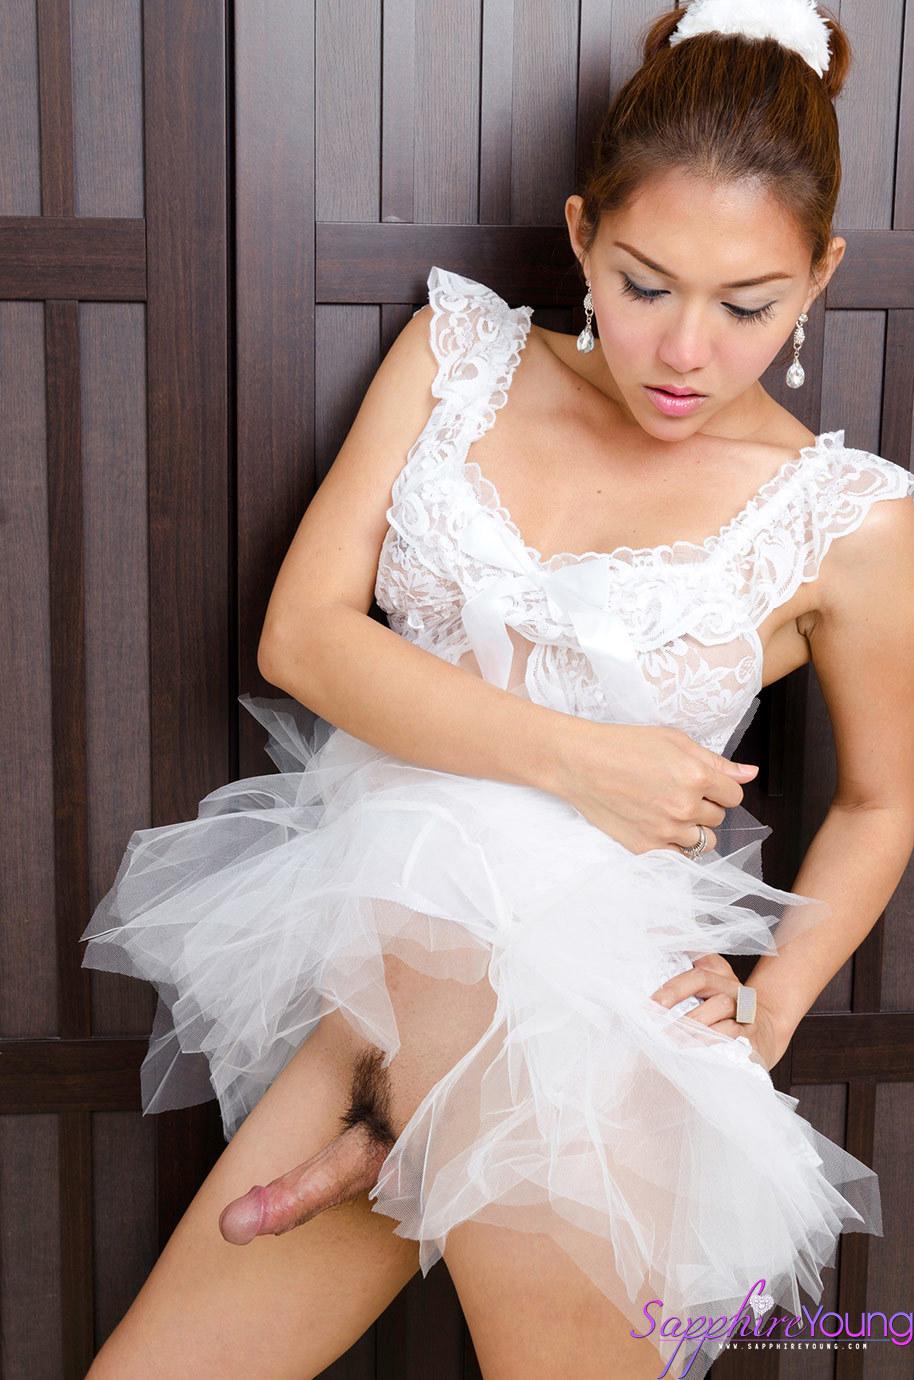 This Nice Ballerina Has A Huge Erect Surprise Under Her Toot